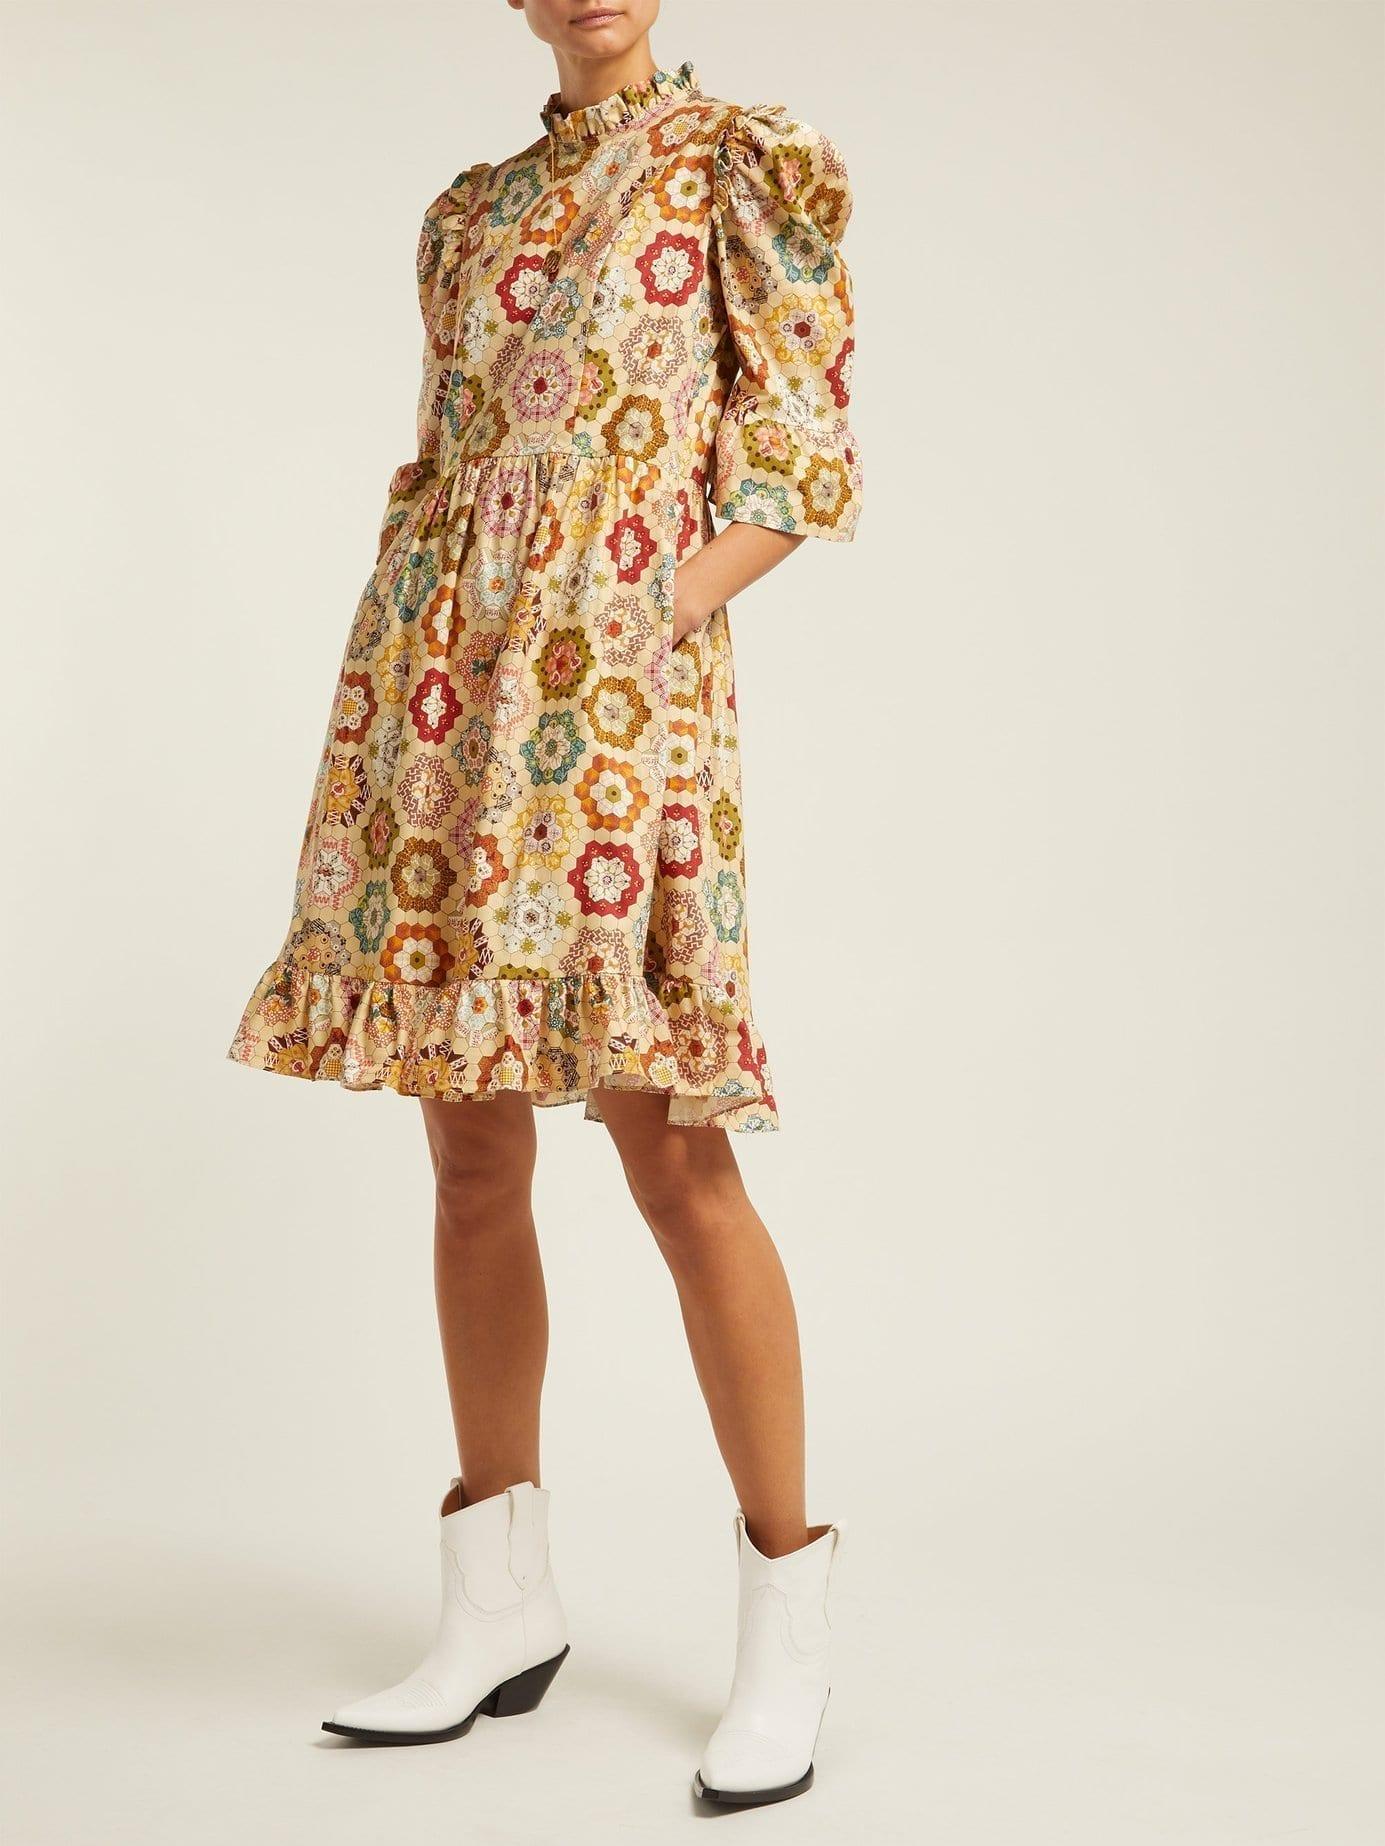 BATSHEVA Kaleidoscopic Print Cotton Beige Dress